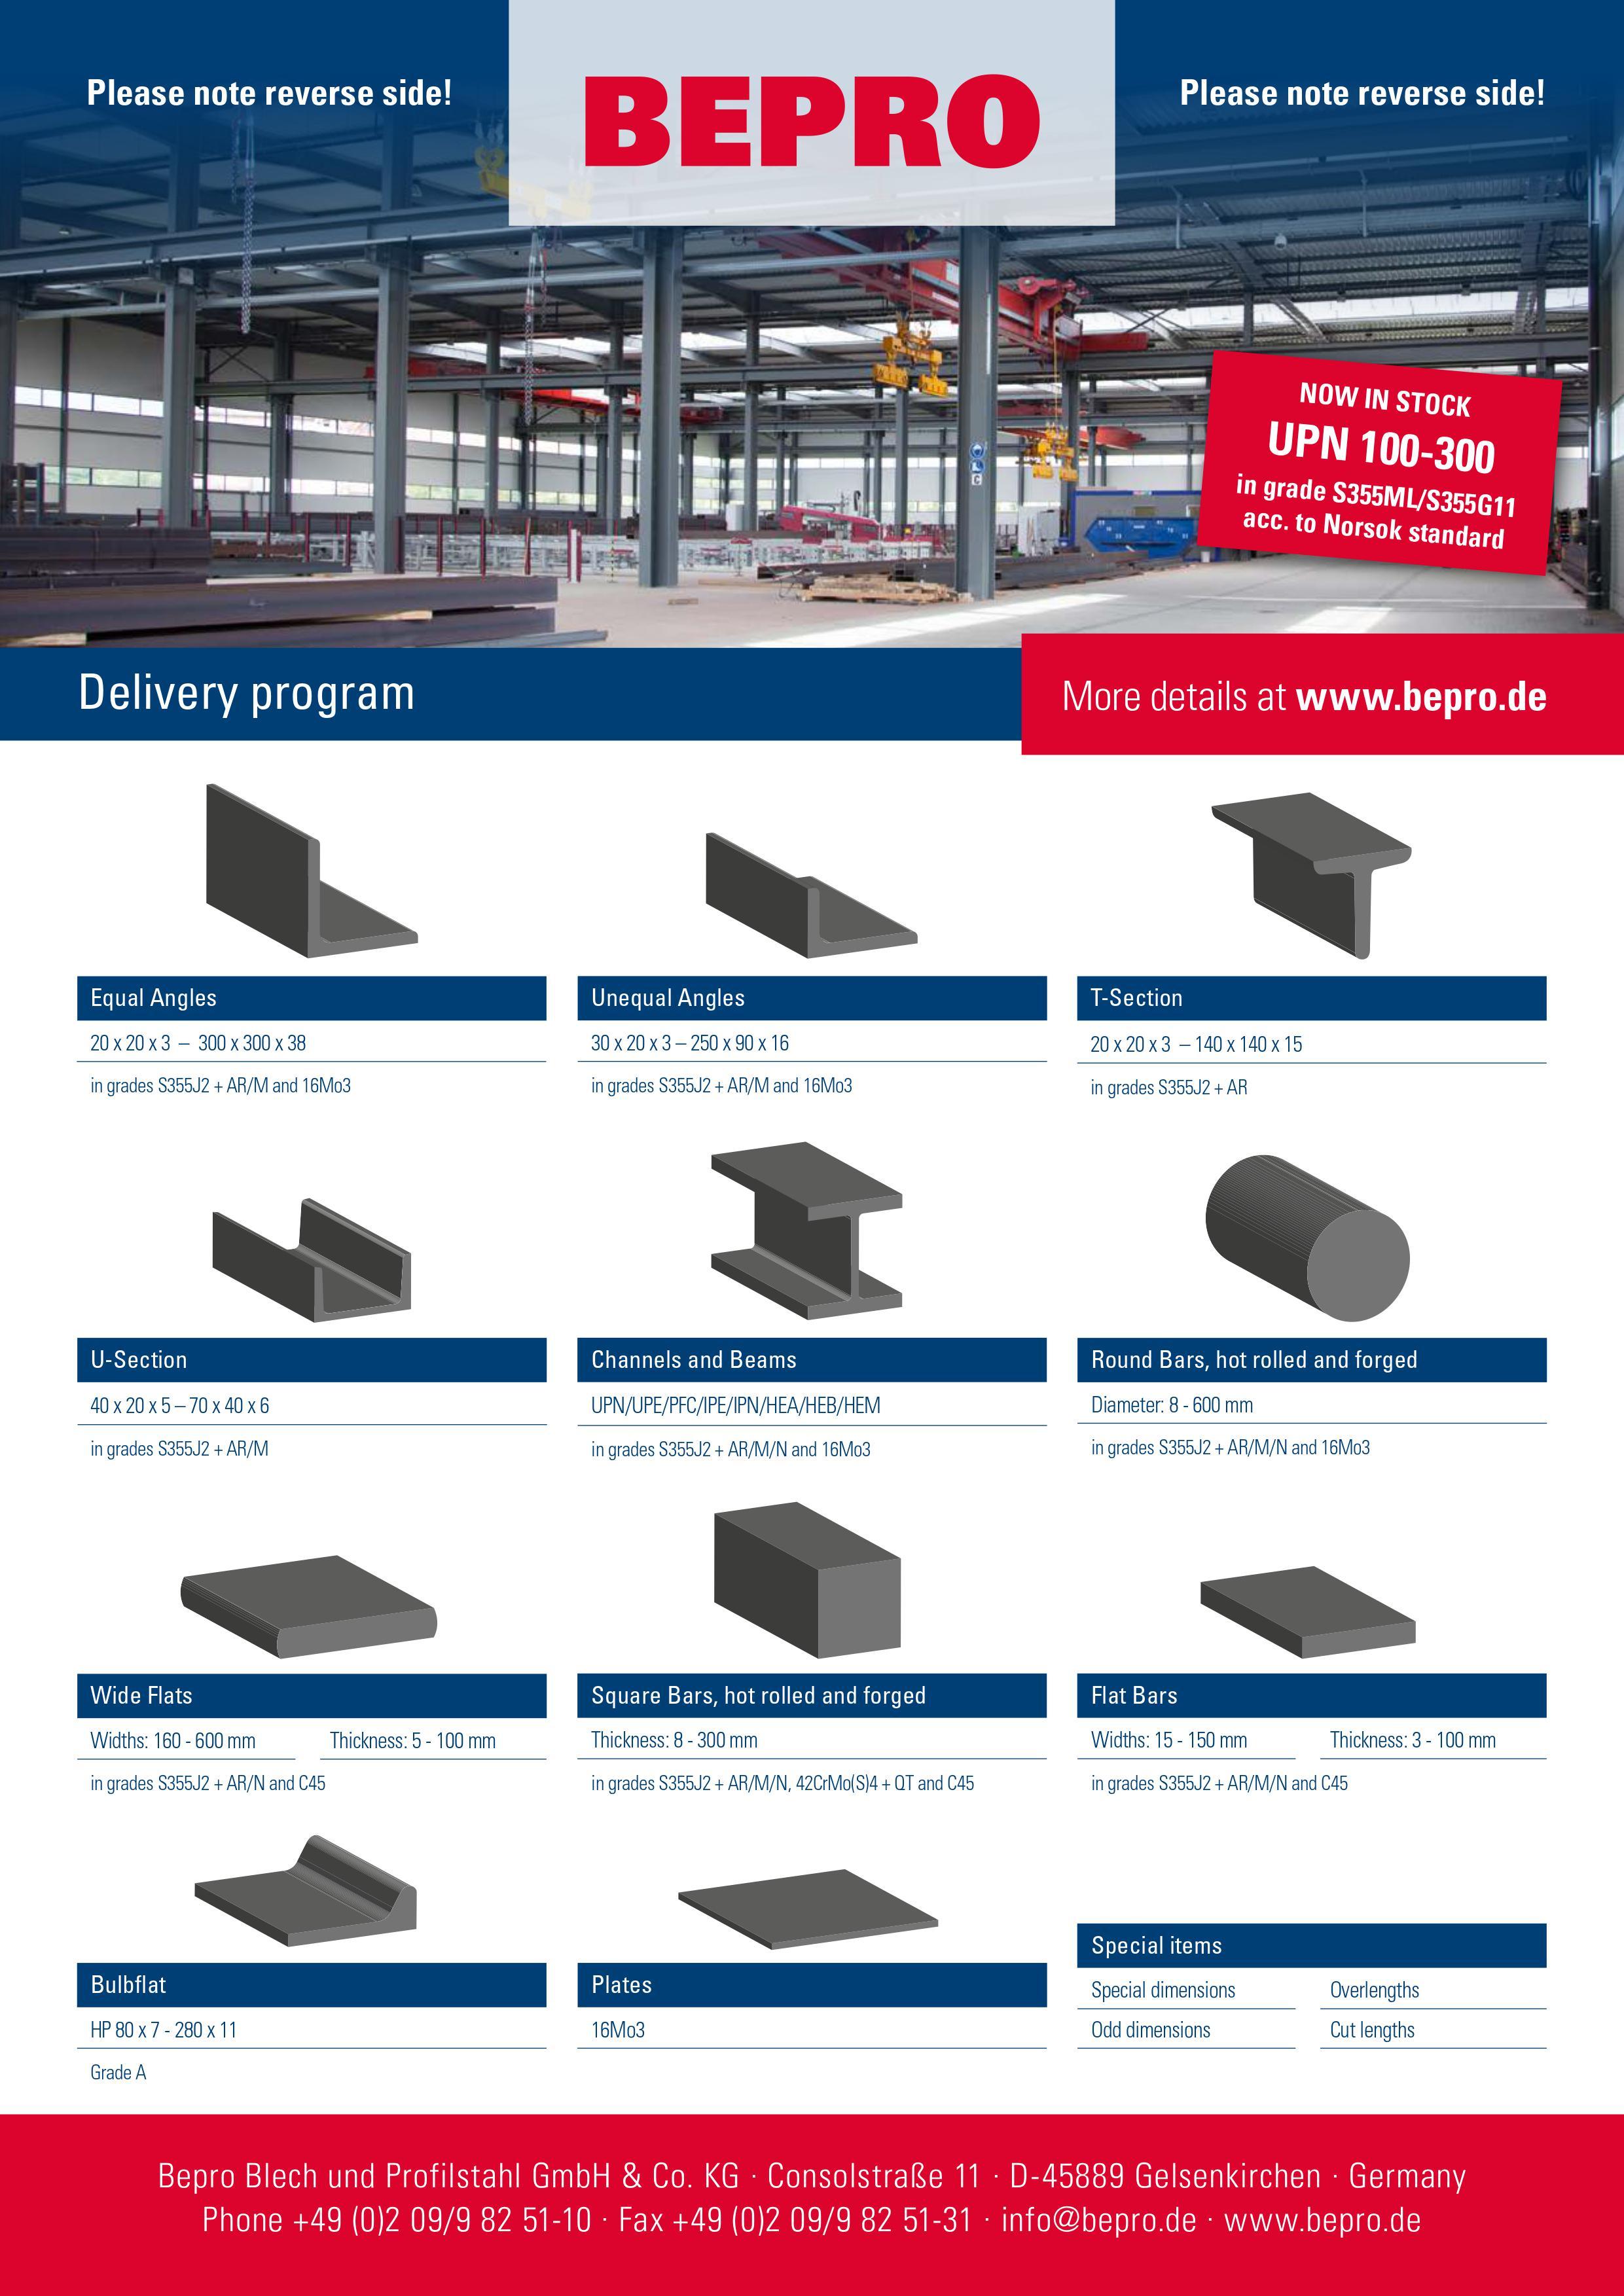 BEPRO Steel Aluminum Beams Supplier